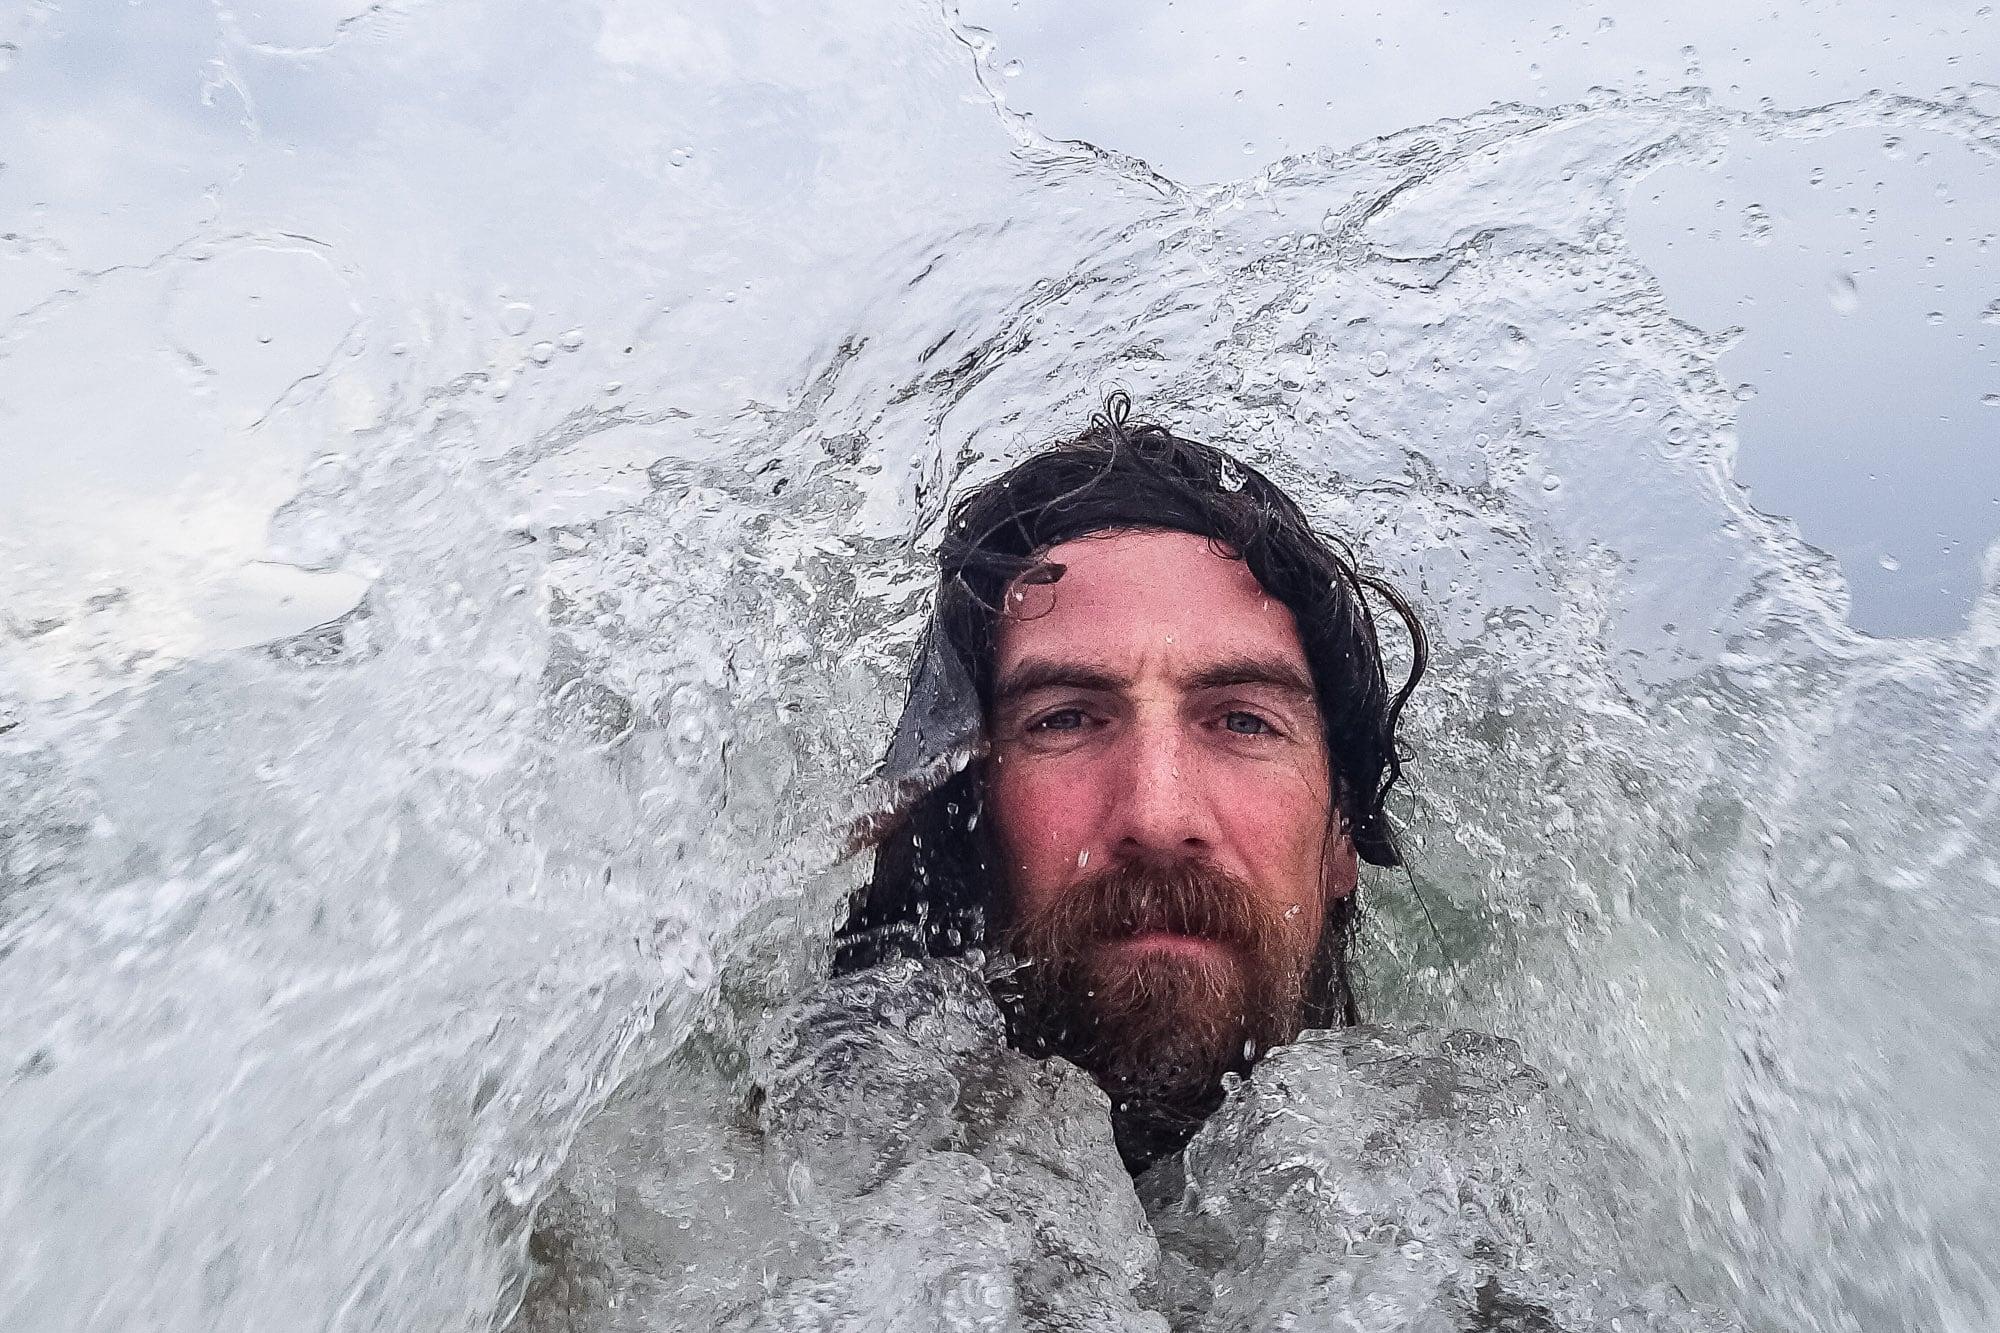 wave selfie 5